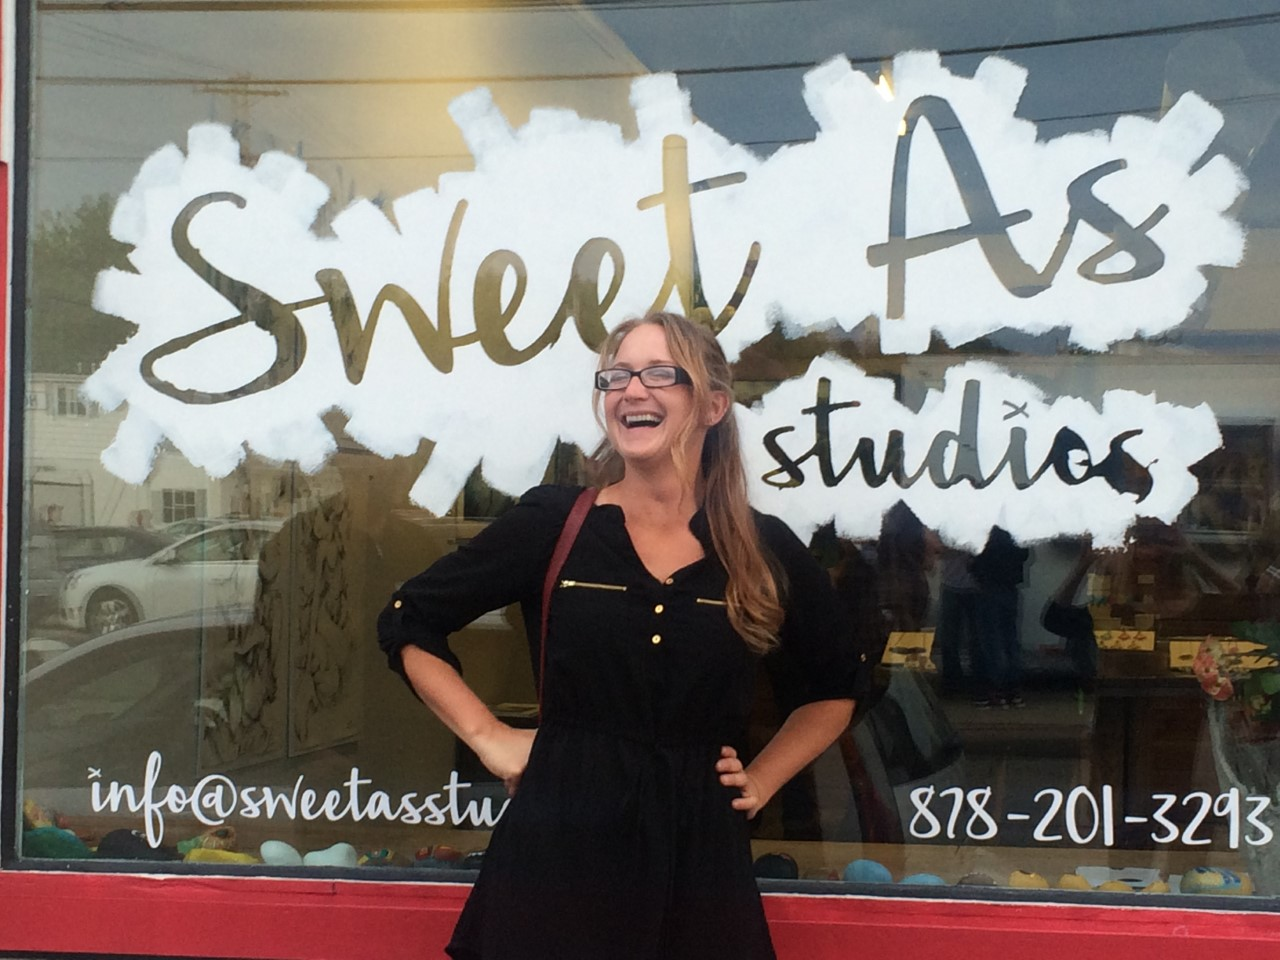 Opening at Sweet As Studios in Bridgewater PA 05-07-16